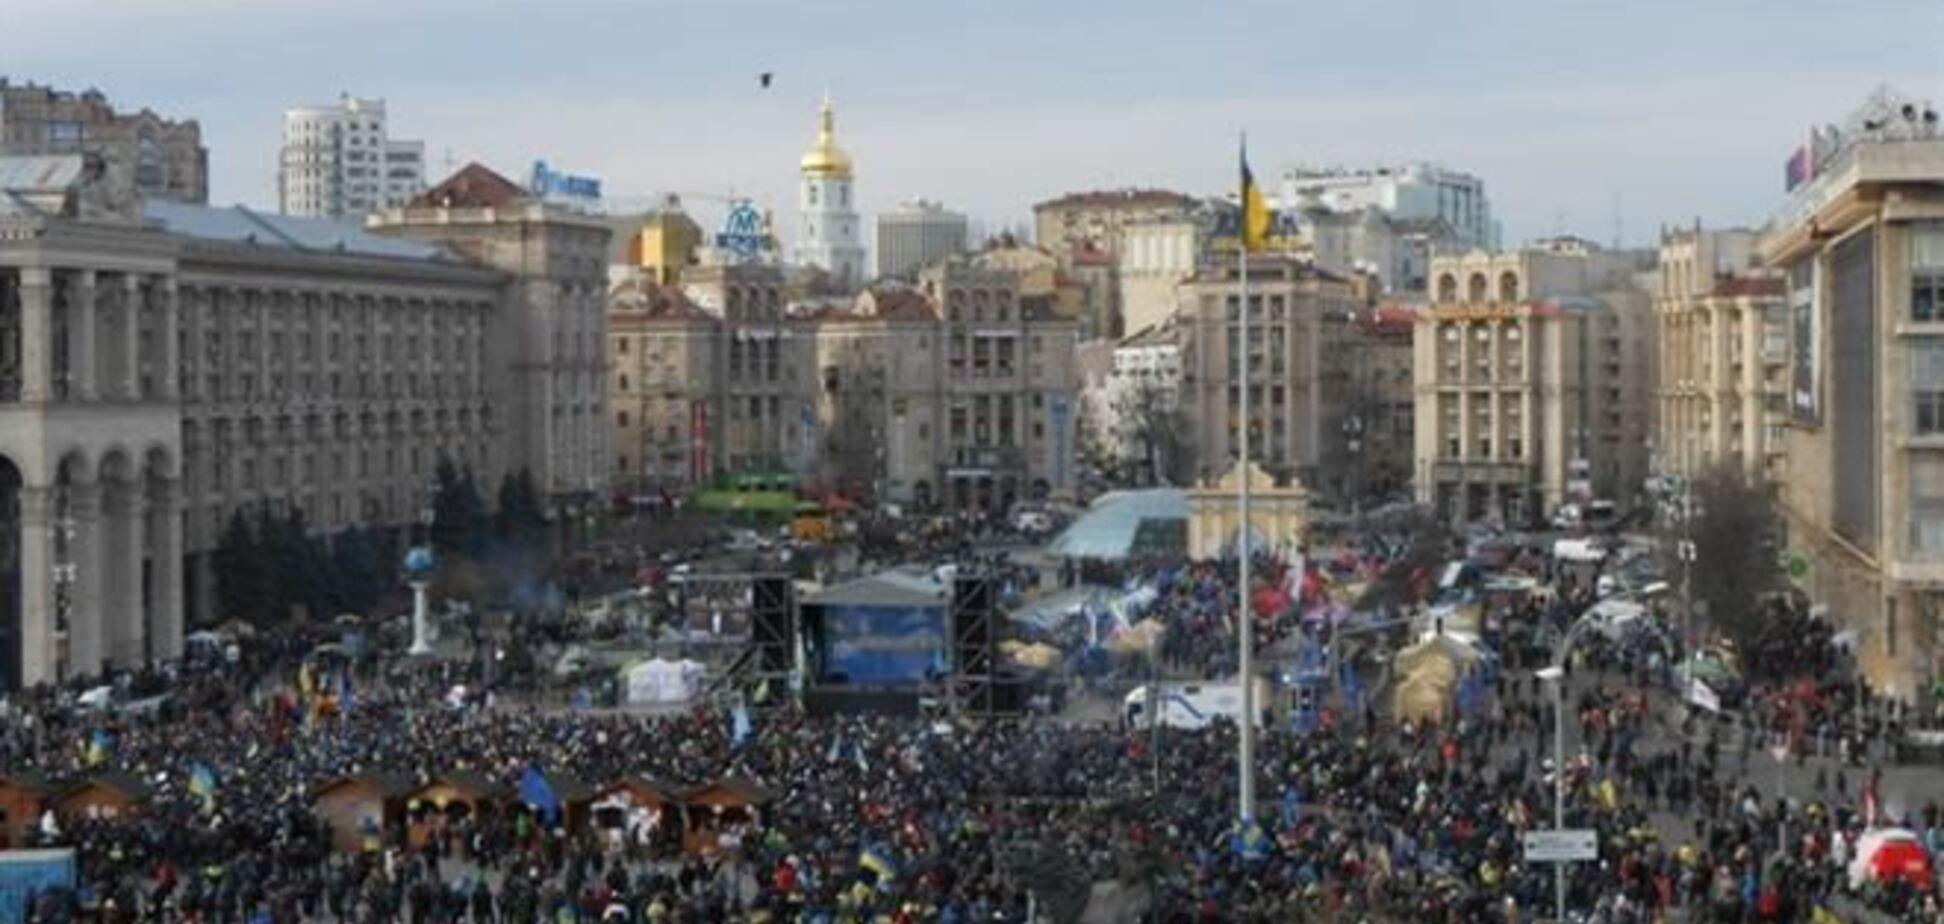 Евромайдан организовал Службу охраны журналистов